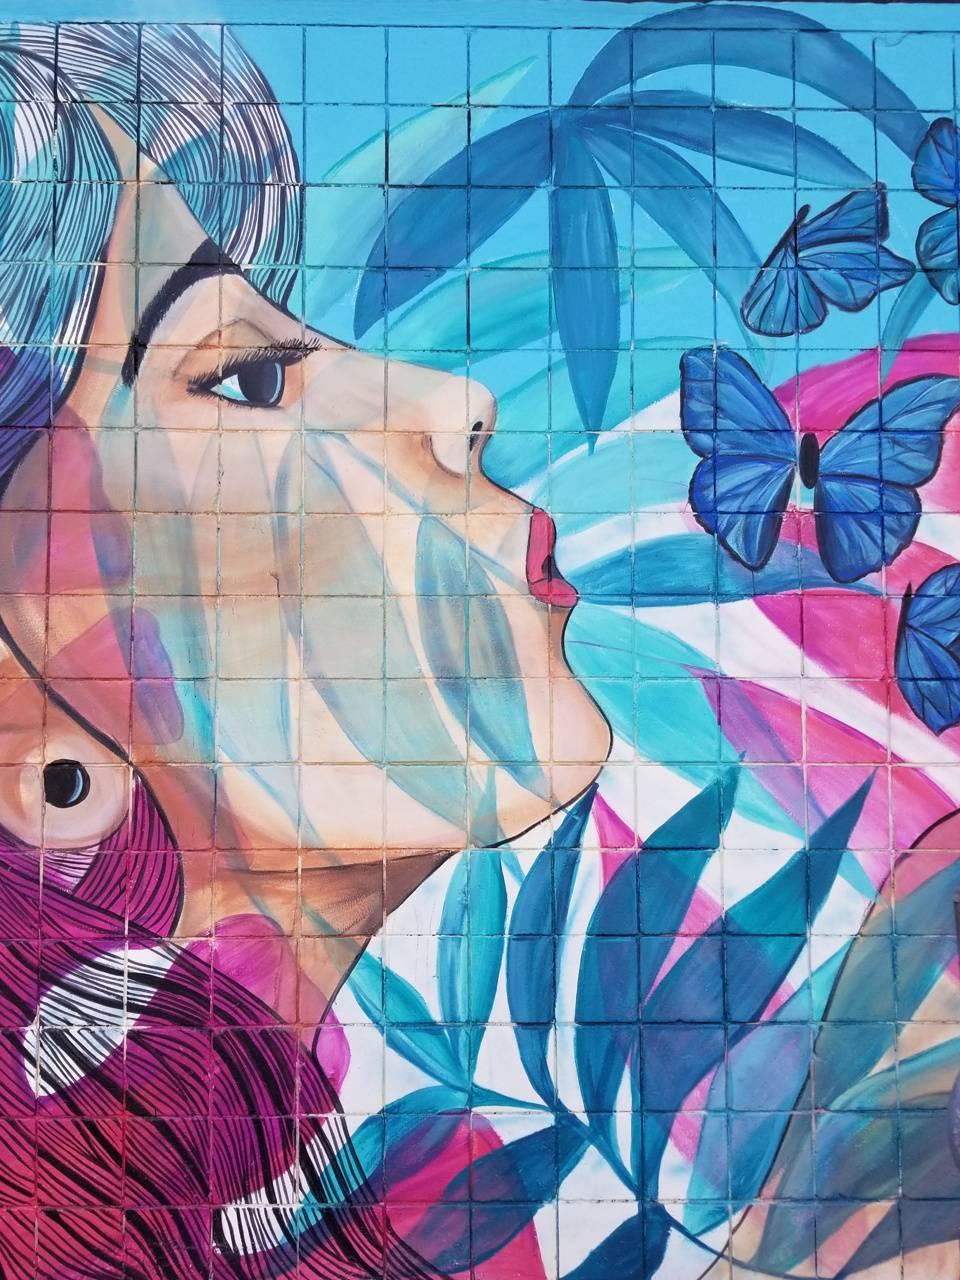 kakaako mural 11